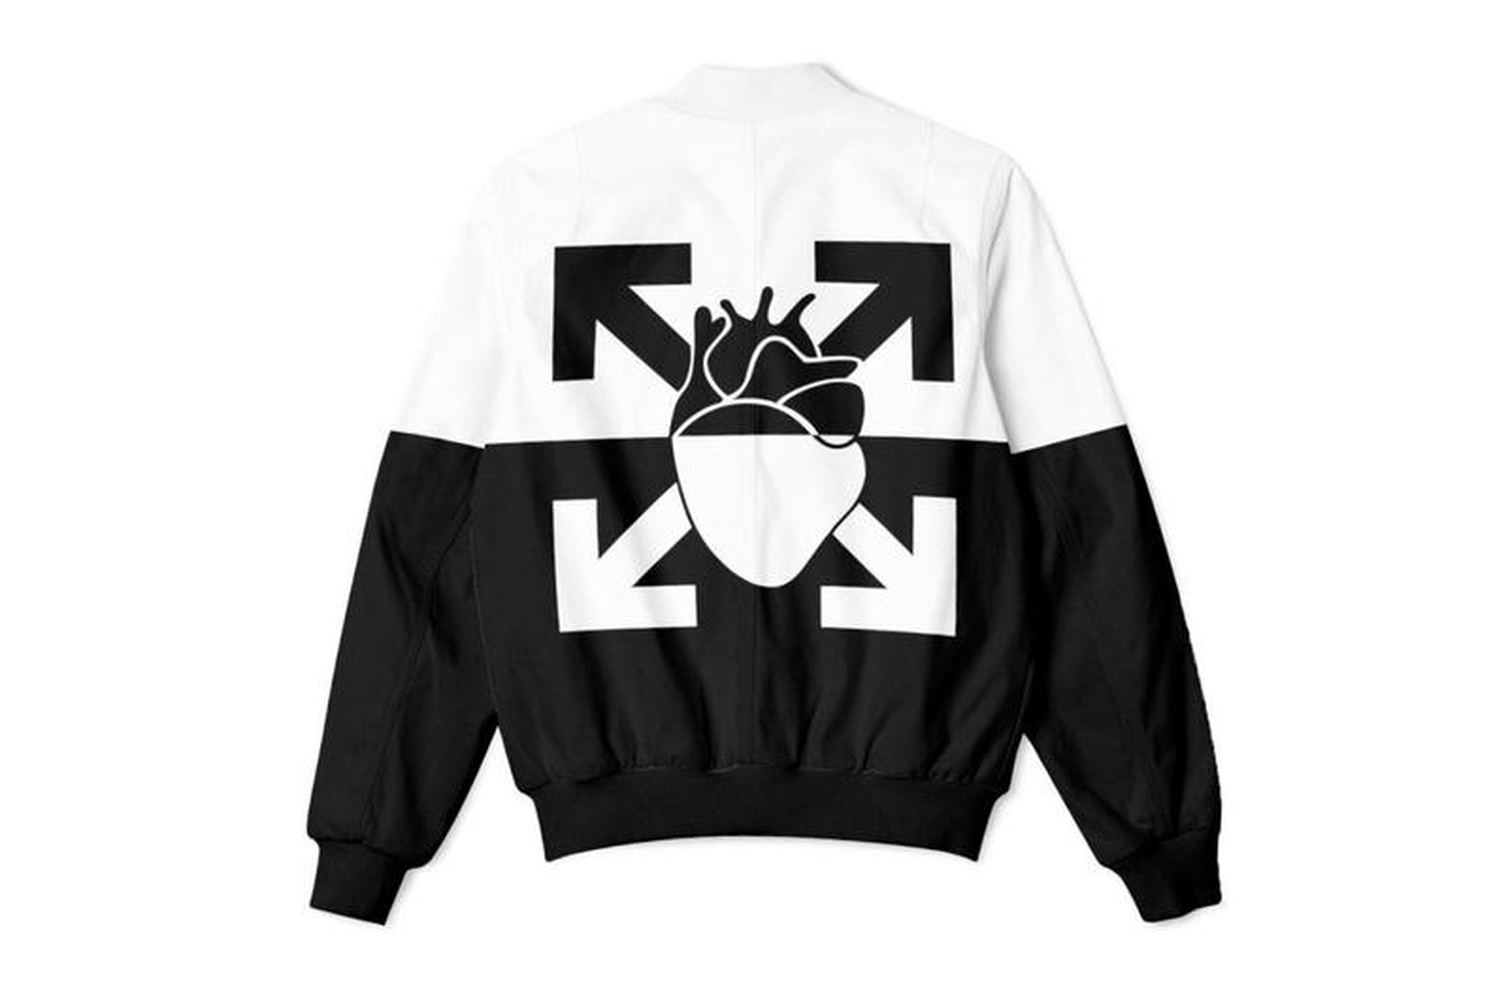 PNL x Off-White™ Jacket Replicas Hit the Internet